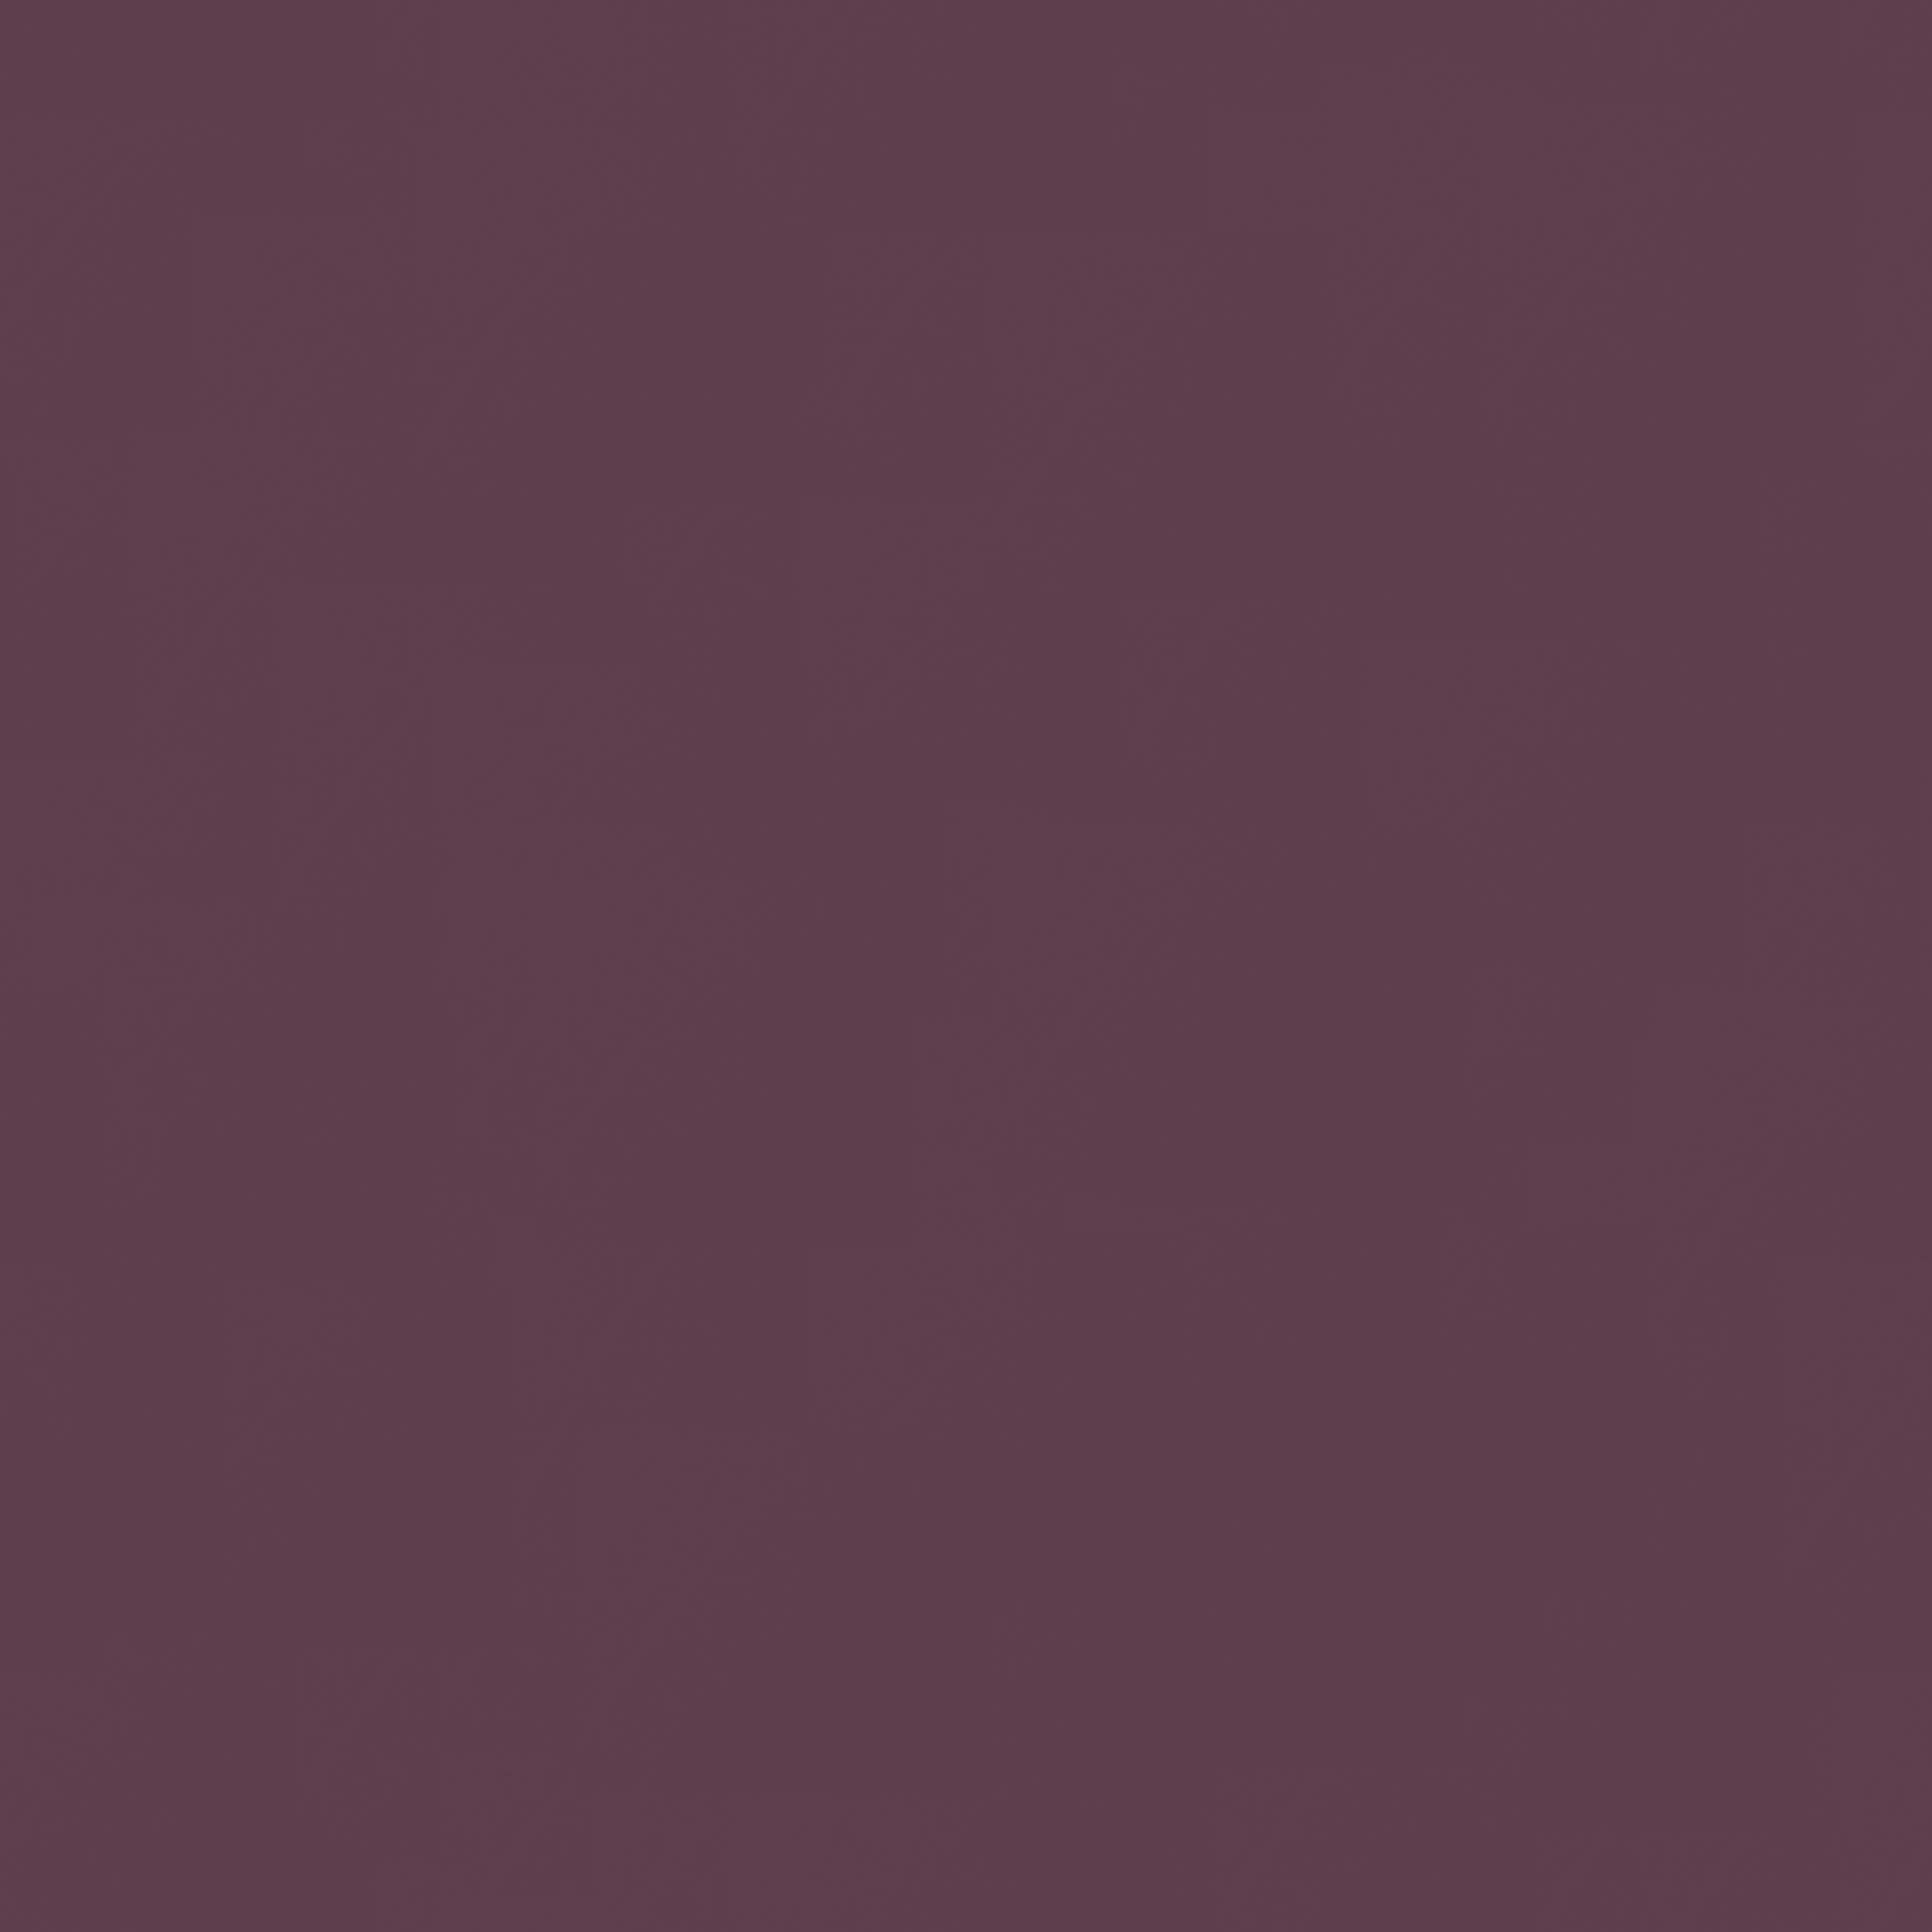 Gordijnen - Shiny little spark Mauve | Home Made By